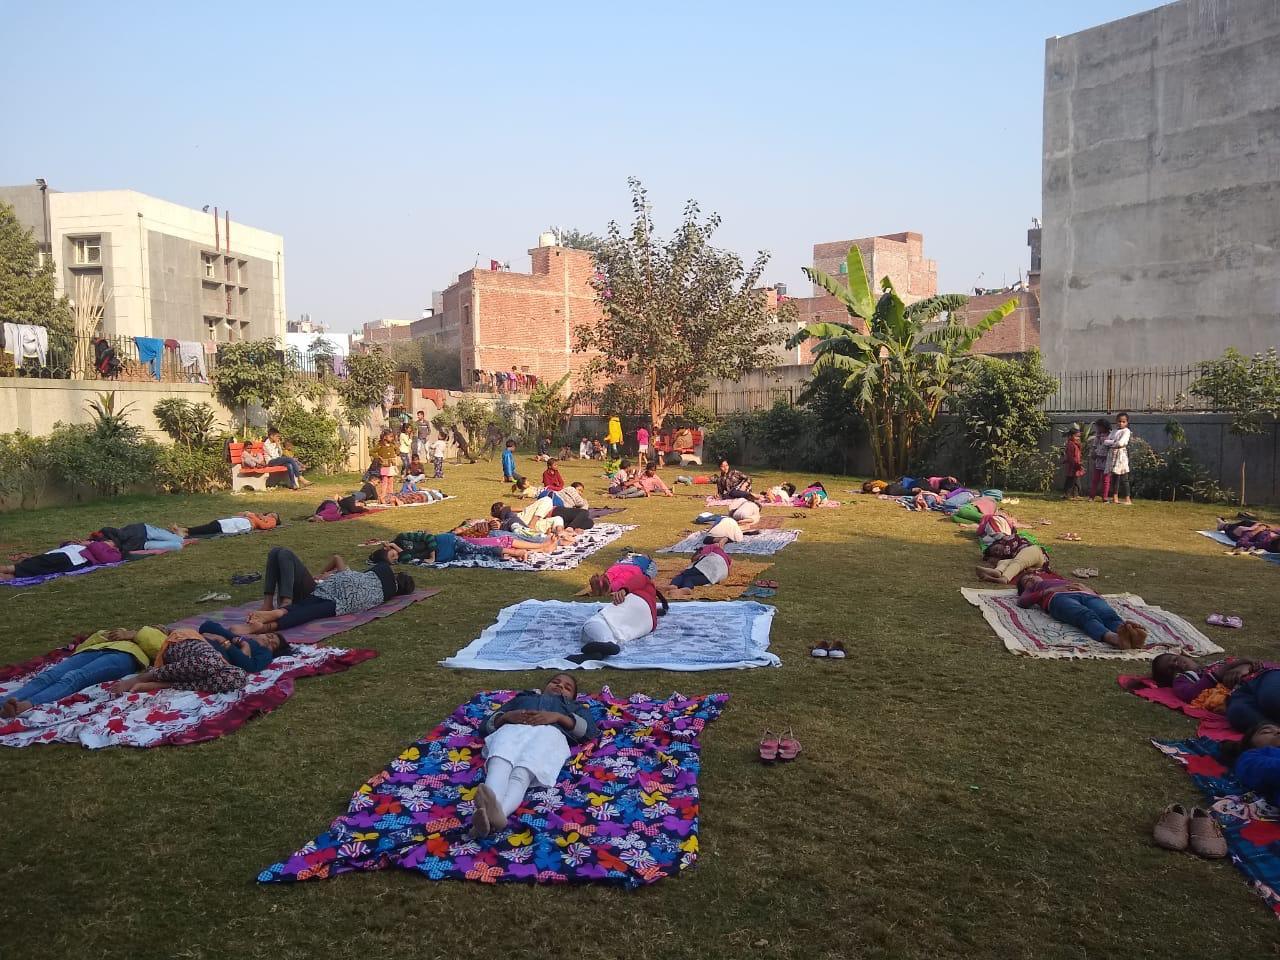 """Meet To Sleep"" Ally, Plan India, AV Baliga Trust and CASP, Delhi (at Mangolpuri Public Park and Madanpur Khadar Public Park)"